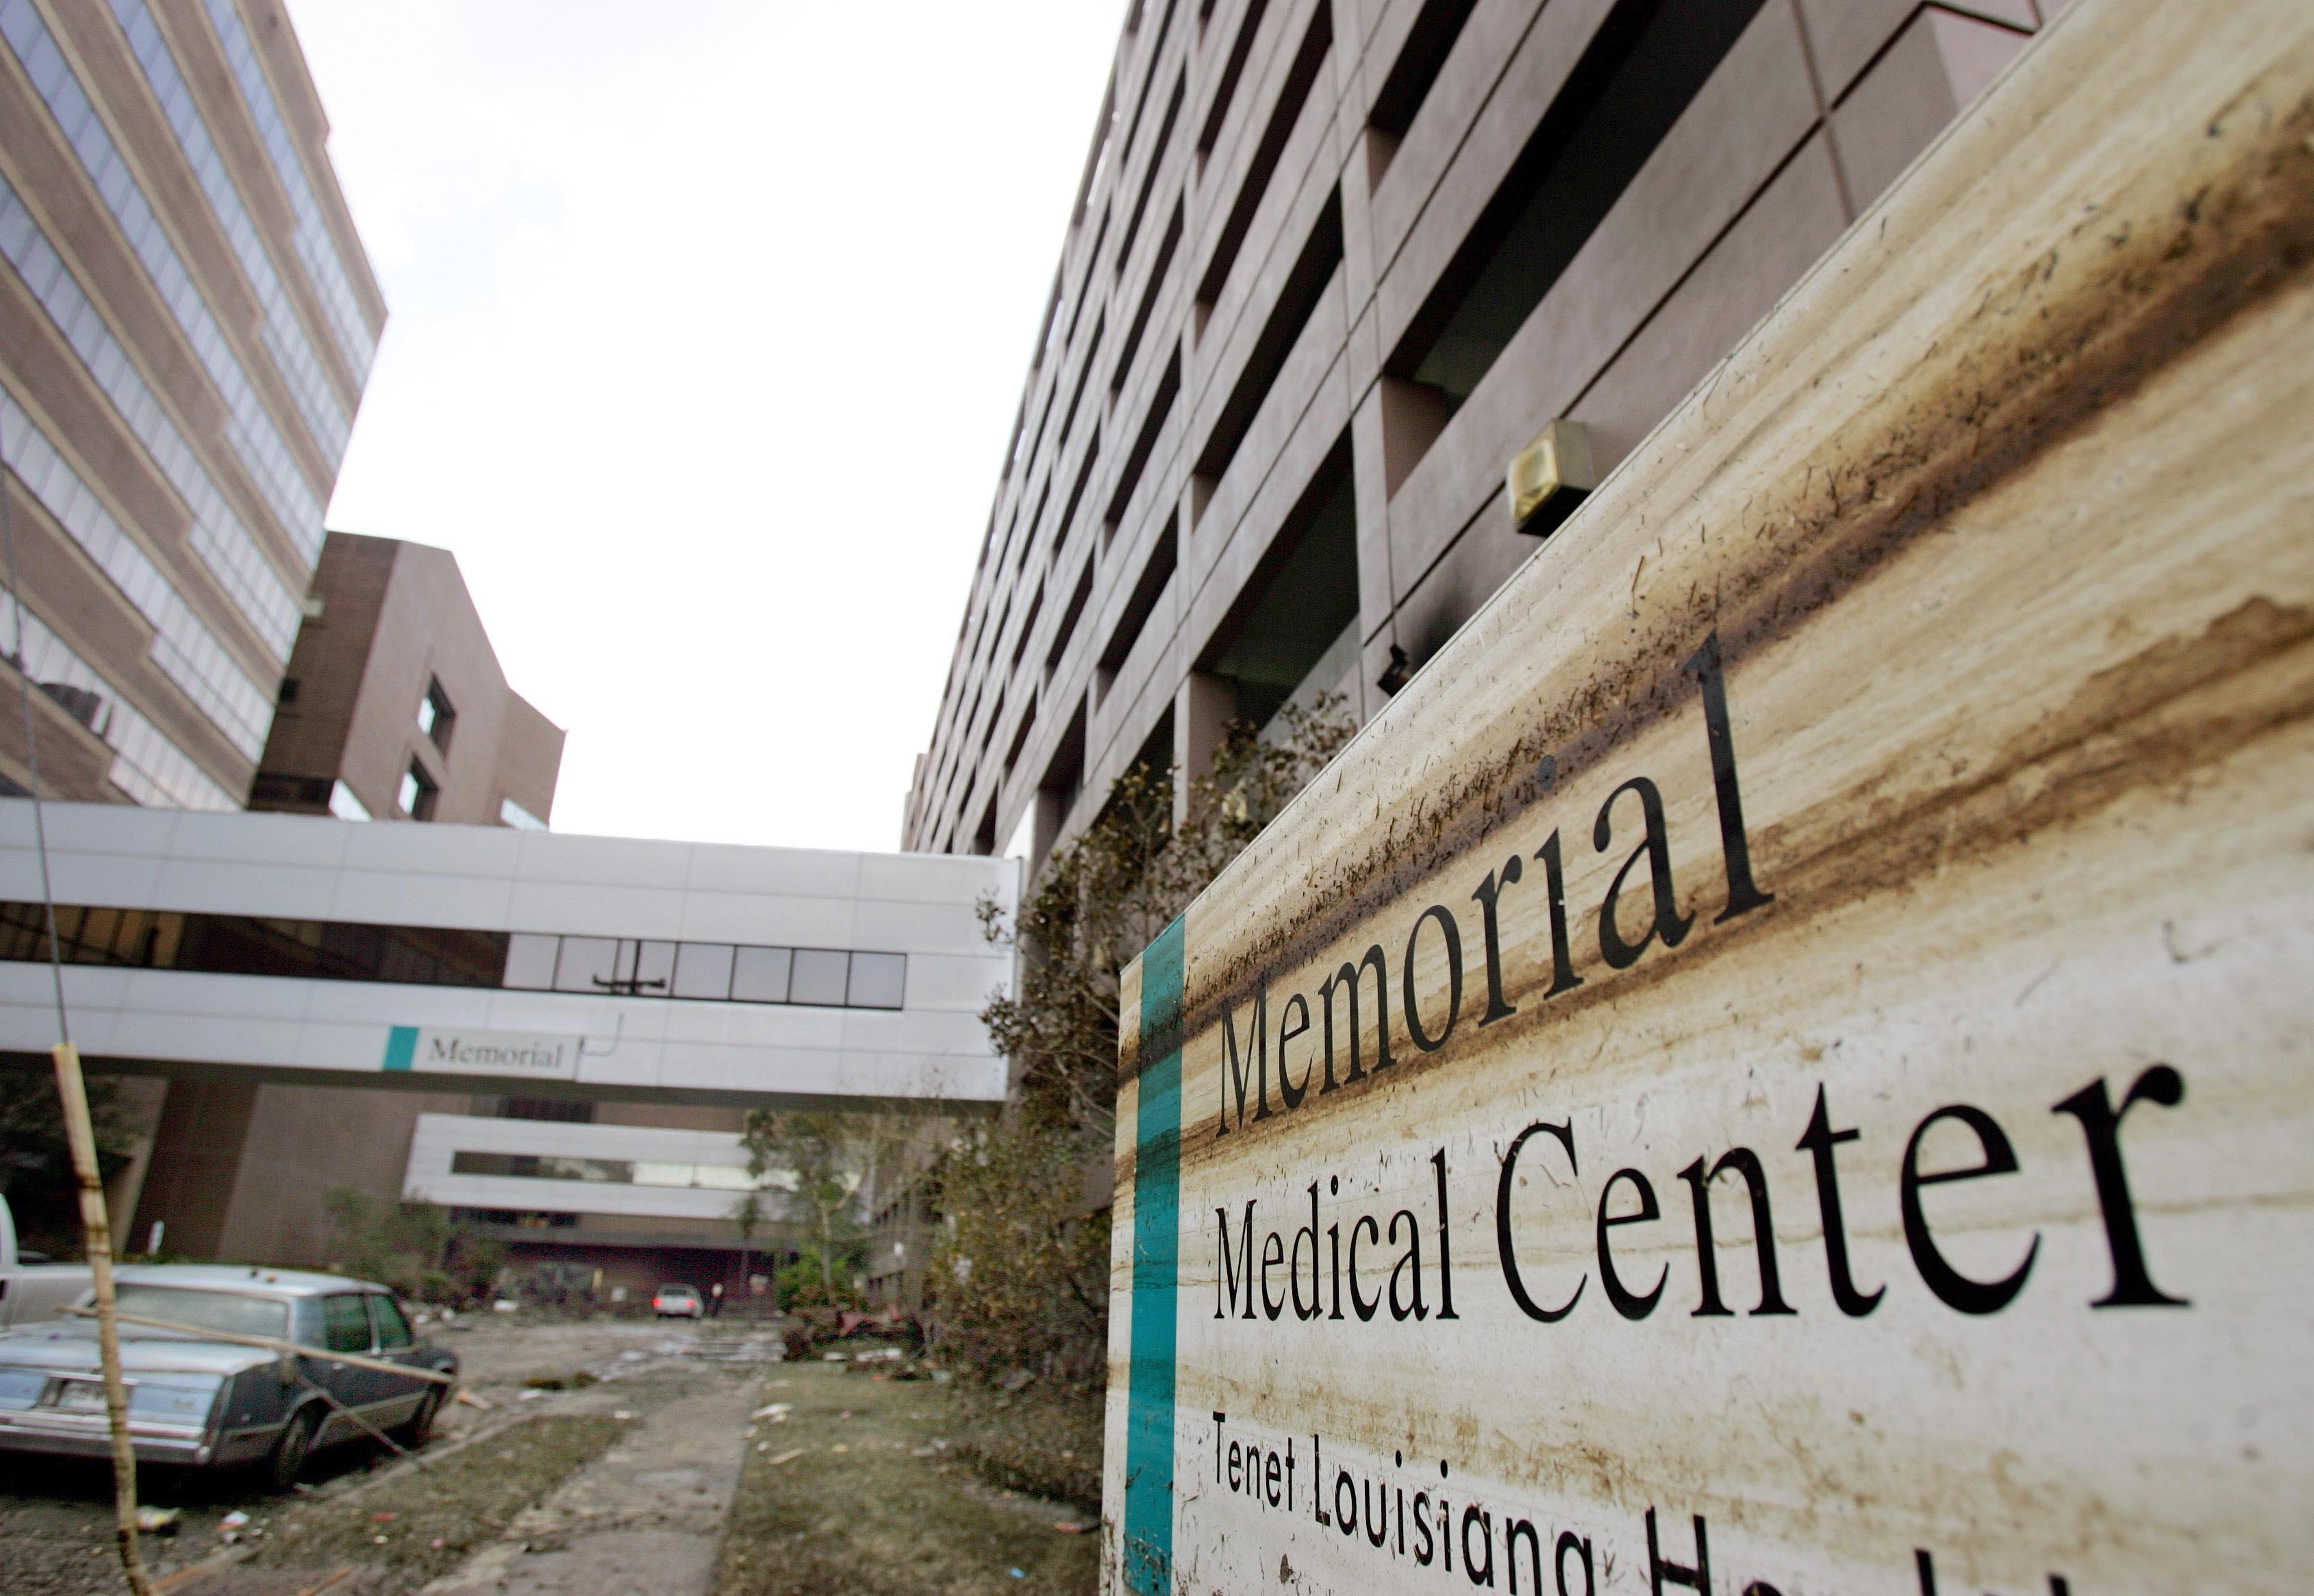 Memorial Medical Center New Orleans